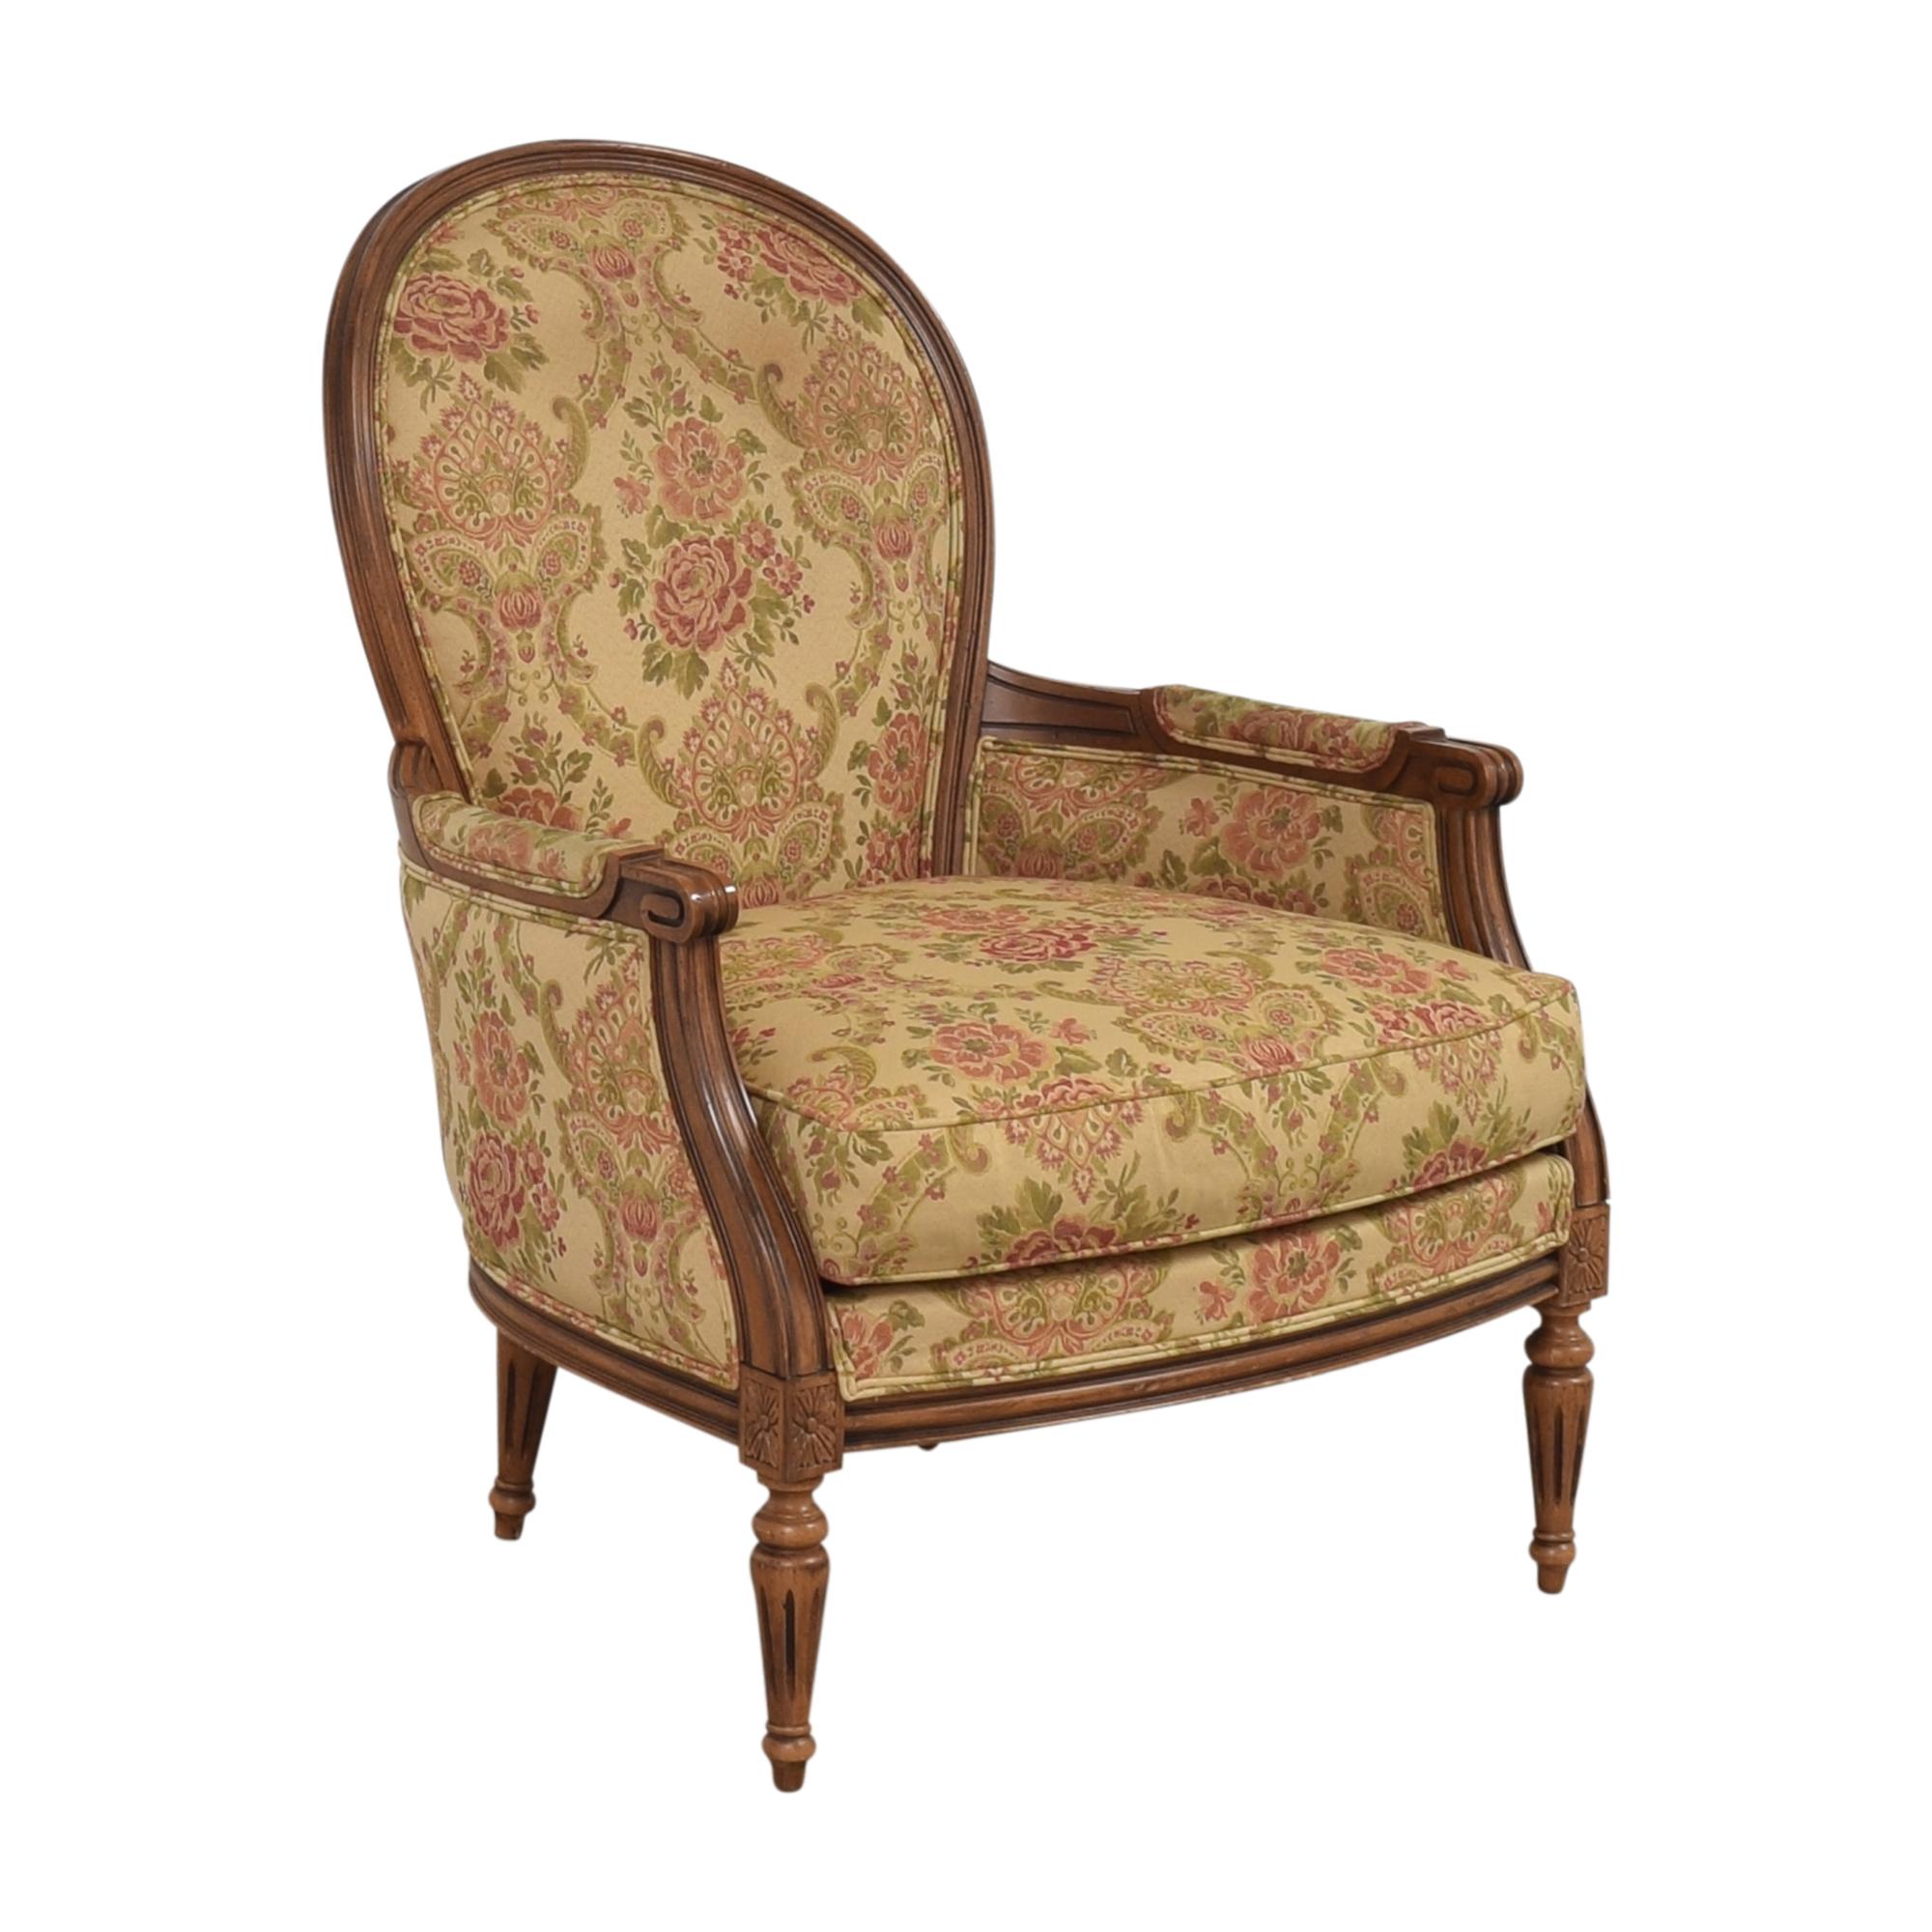 Ethan Allen Ethan Allen Suzette Accent Chair used